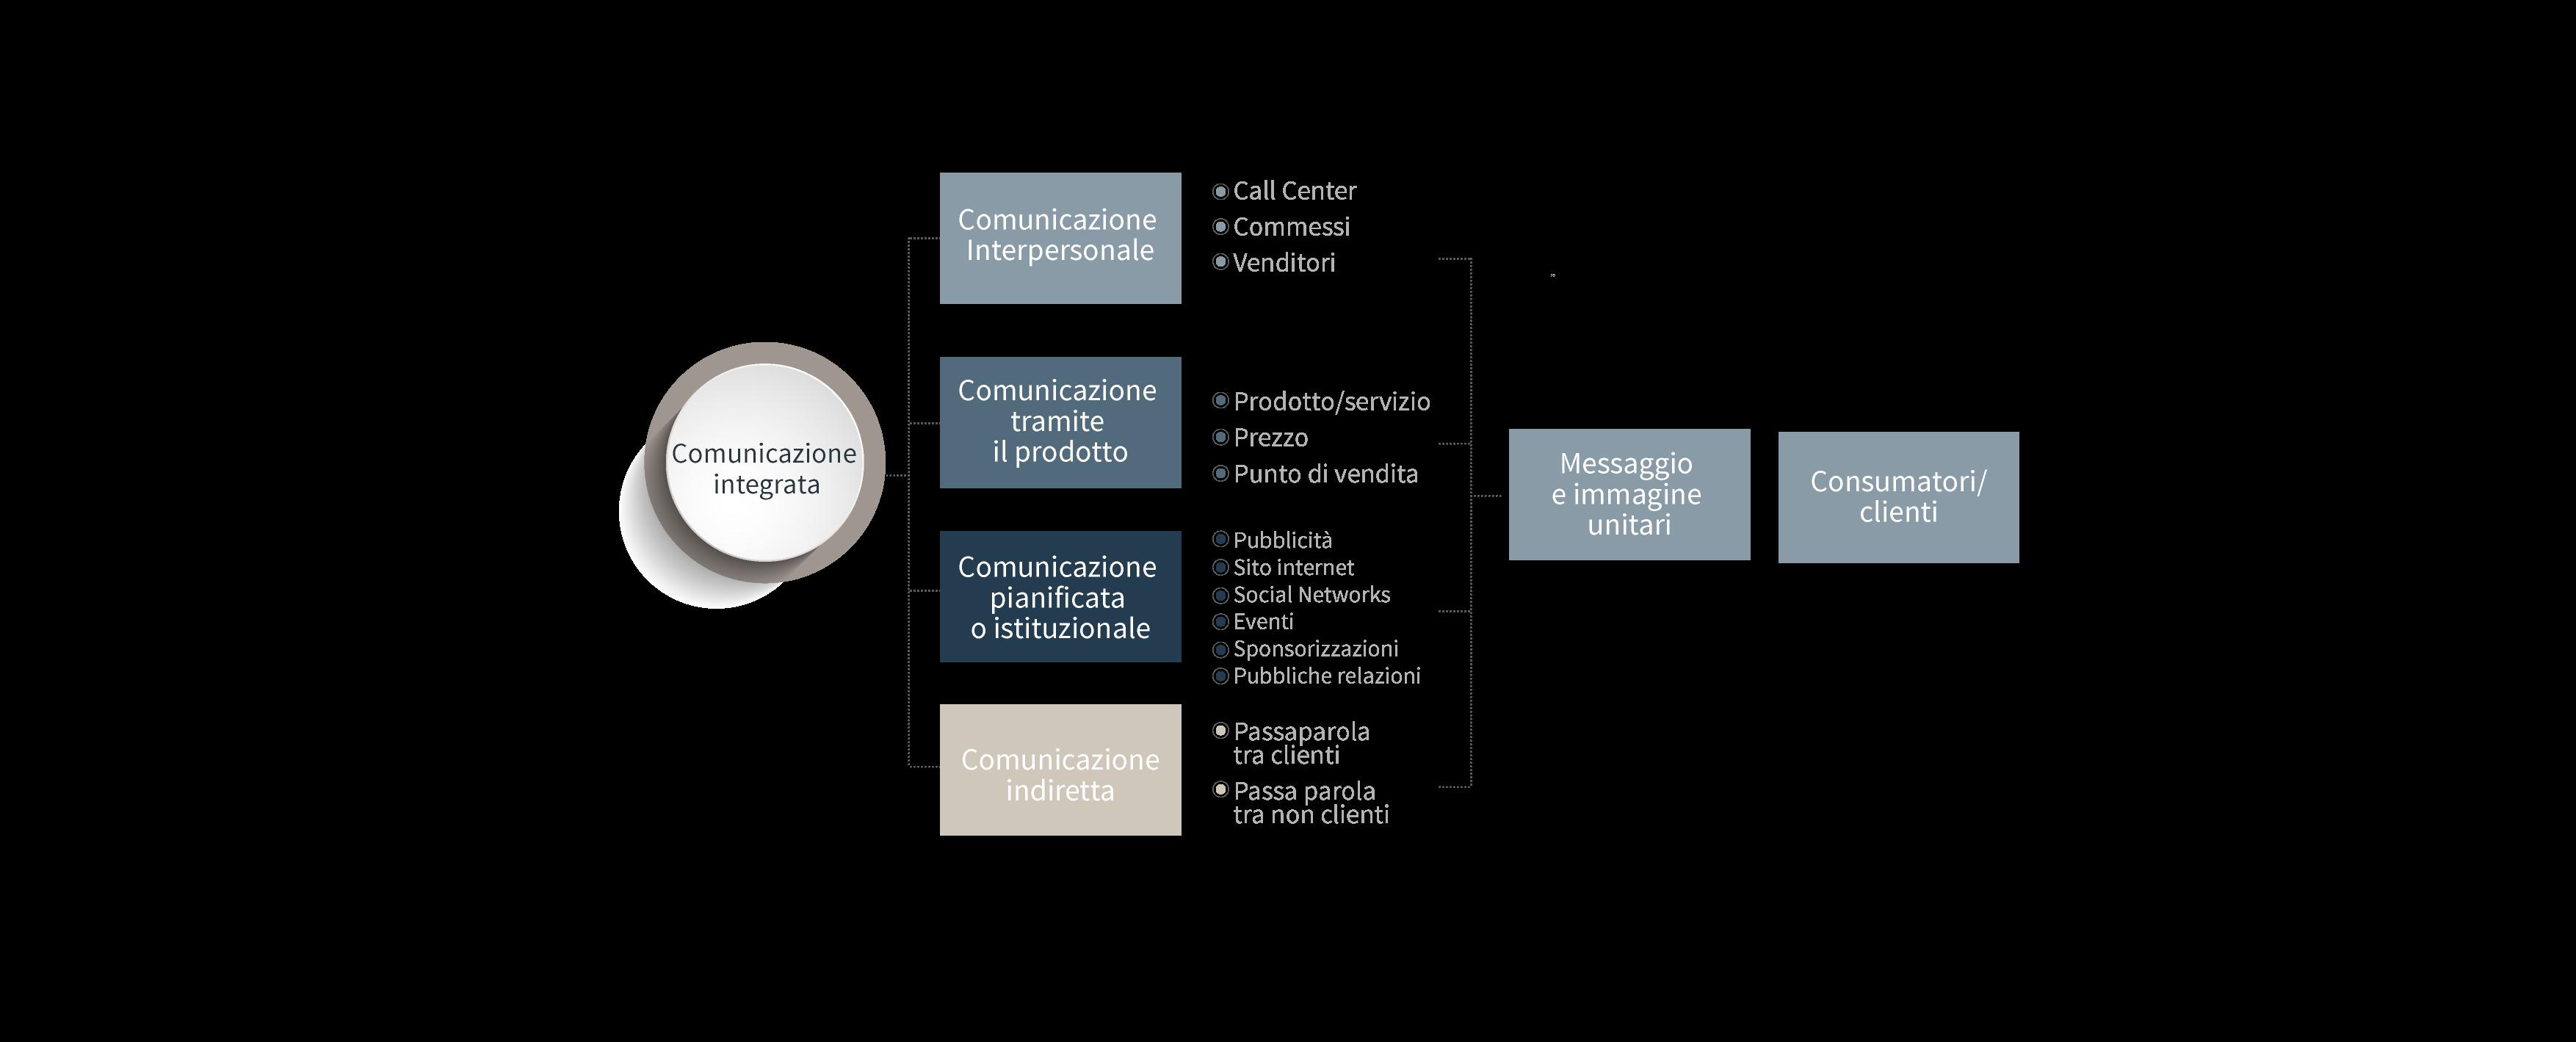 Advertising & Visual Design | Agenzia di Comunicazione Ego NewCom